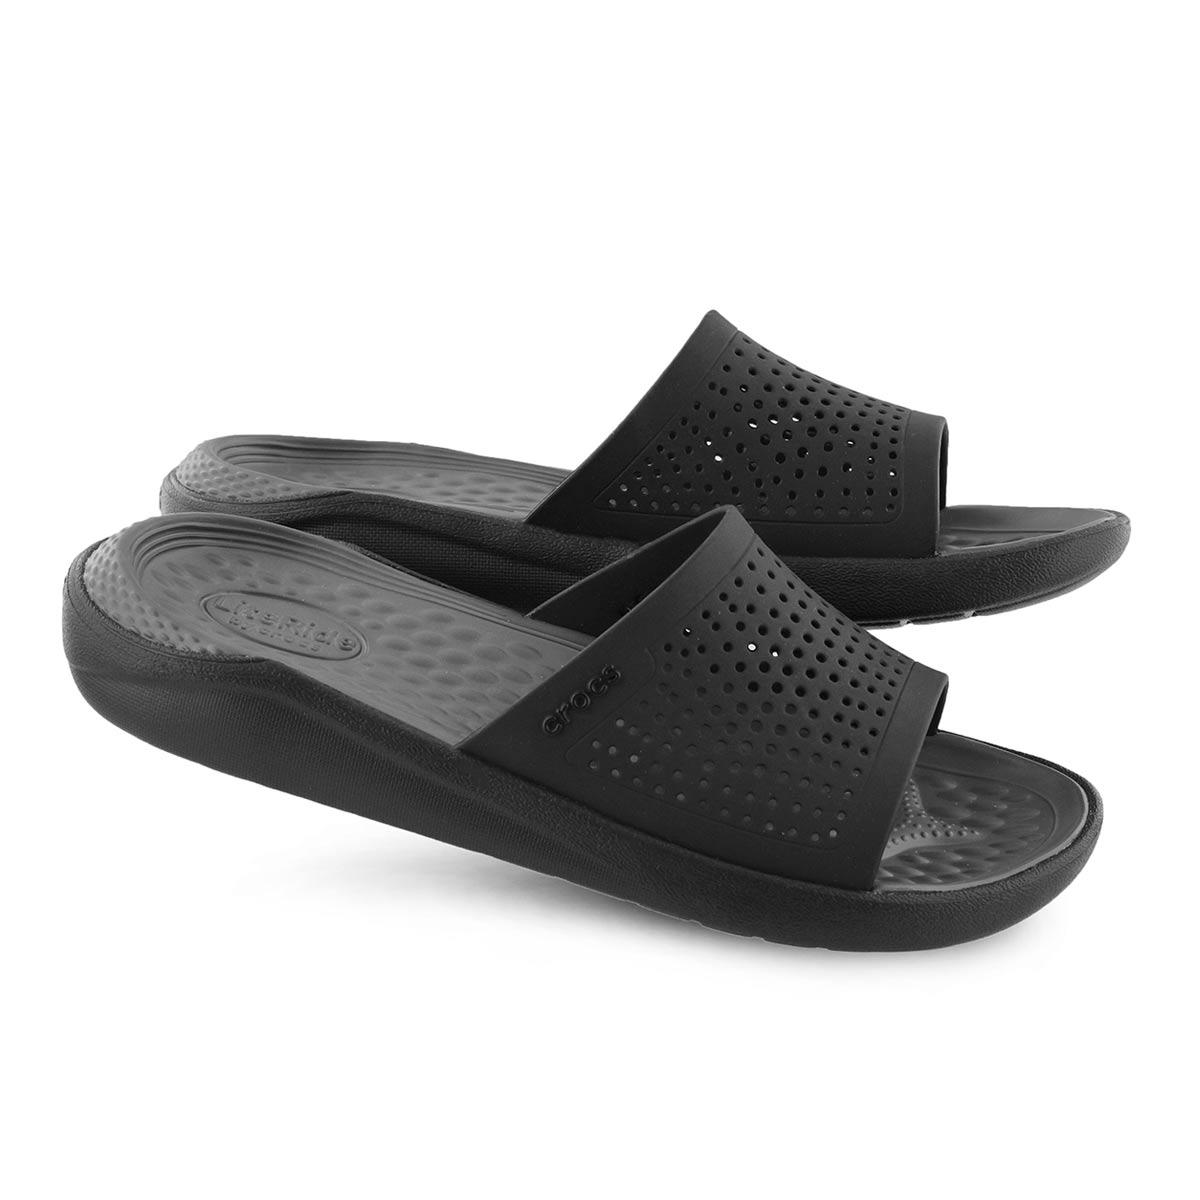 Lds LiteRide blk/slate slide sandal